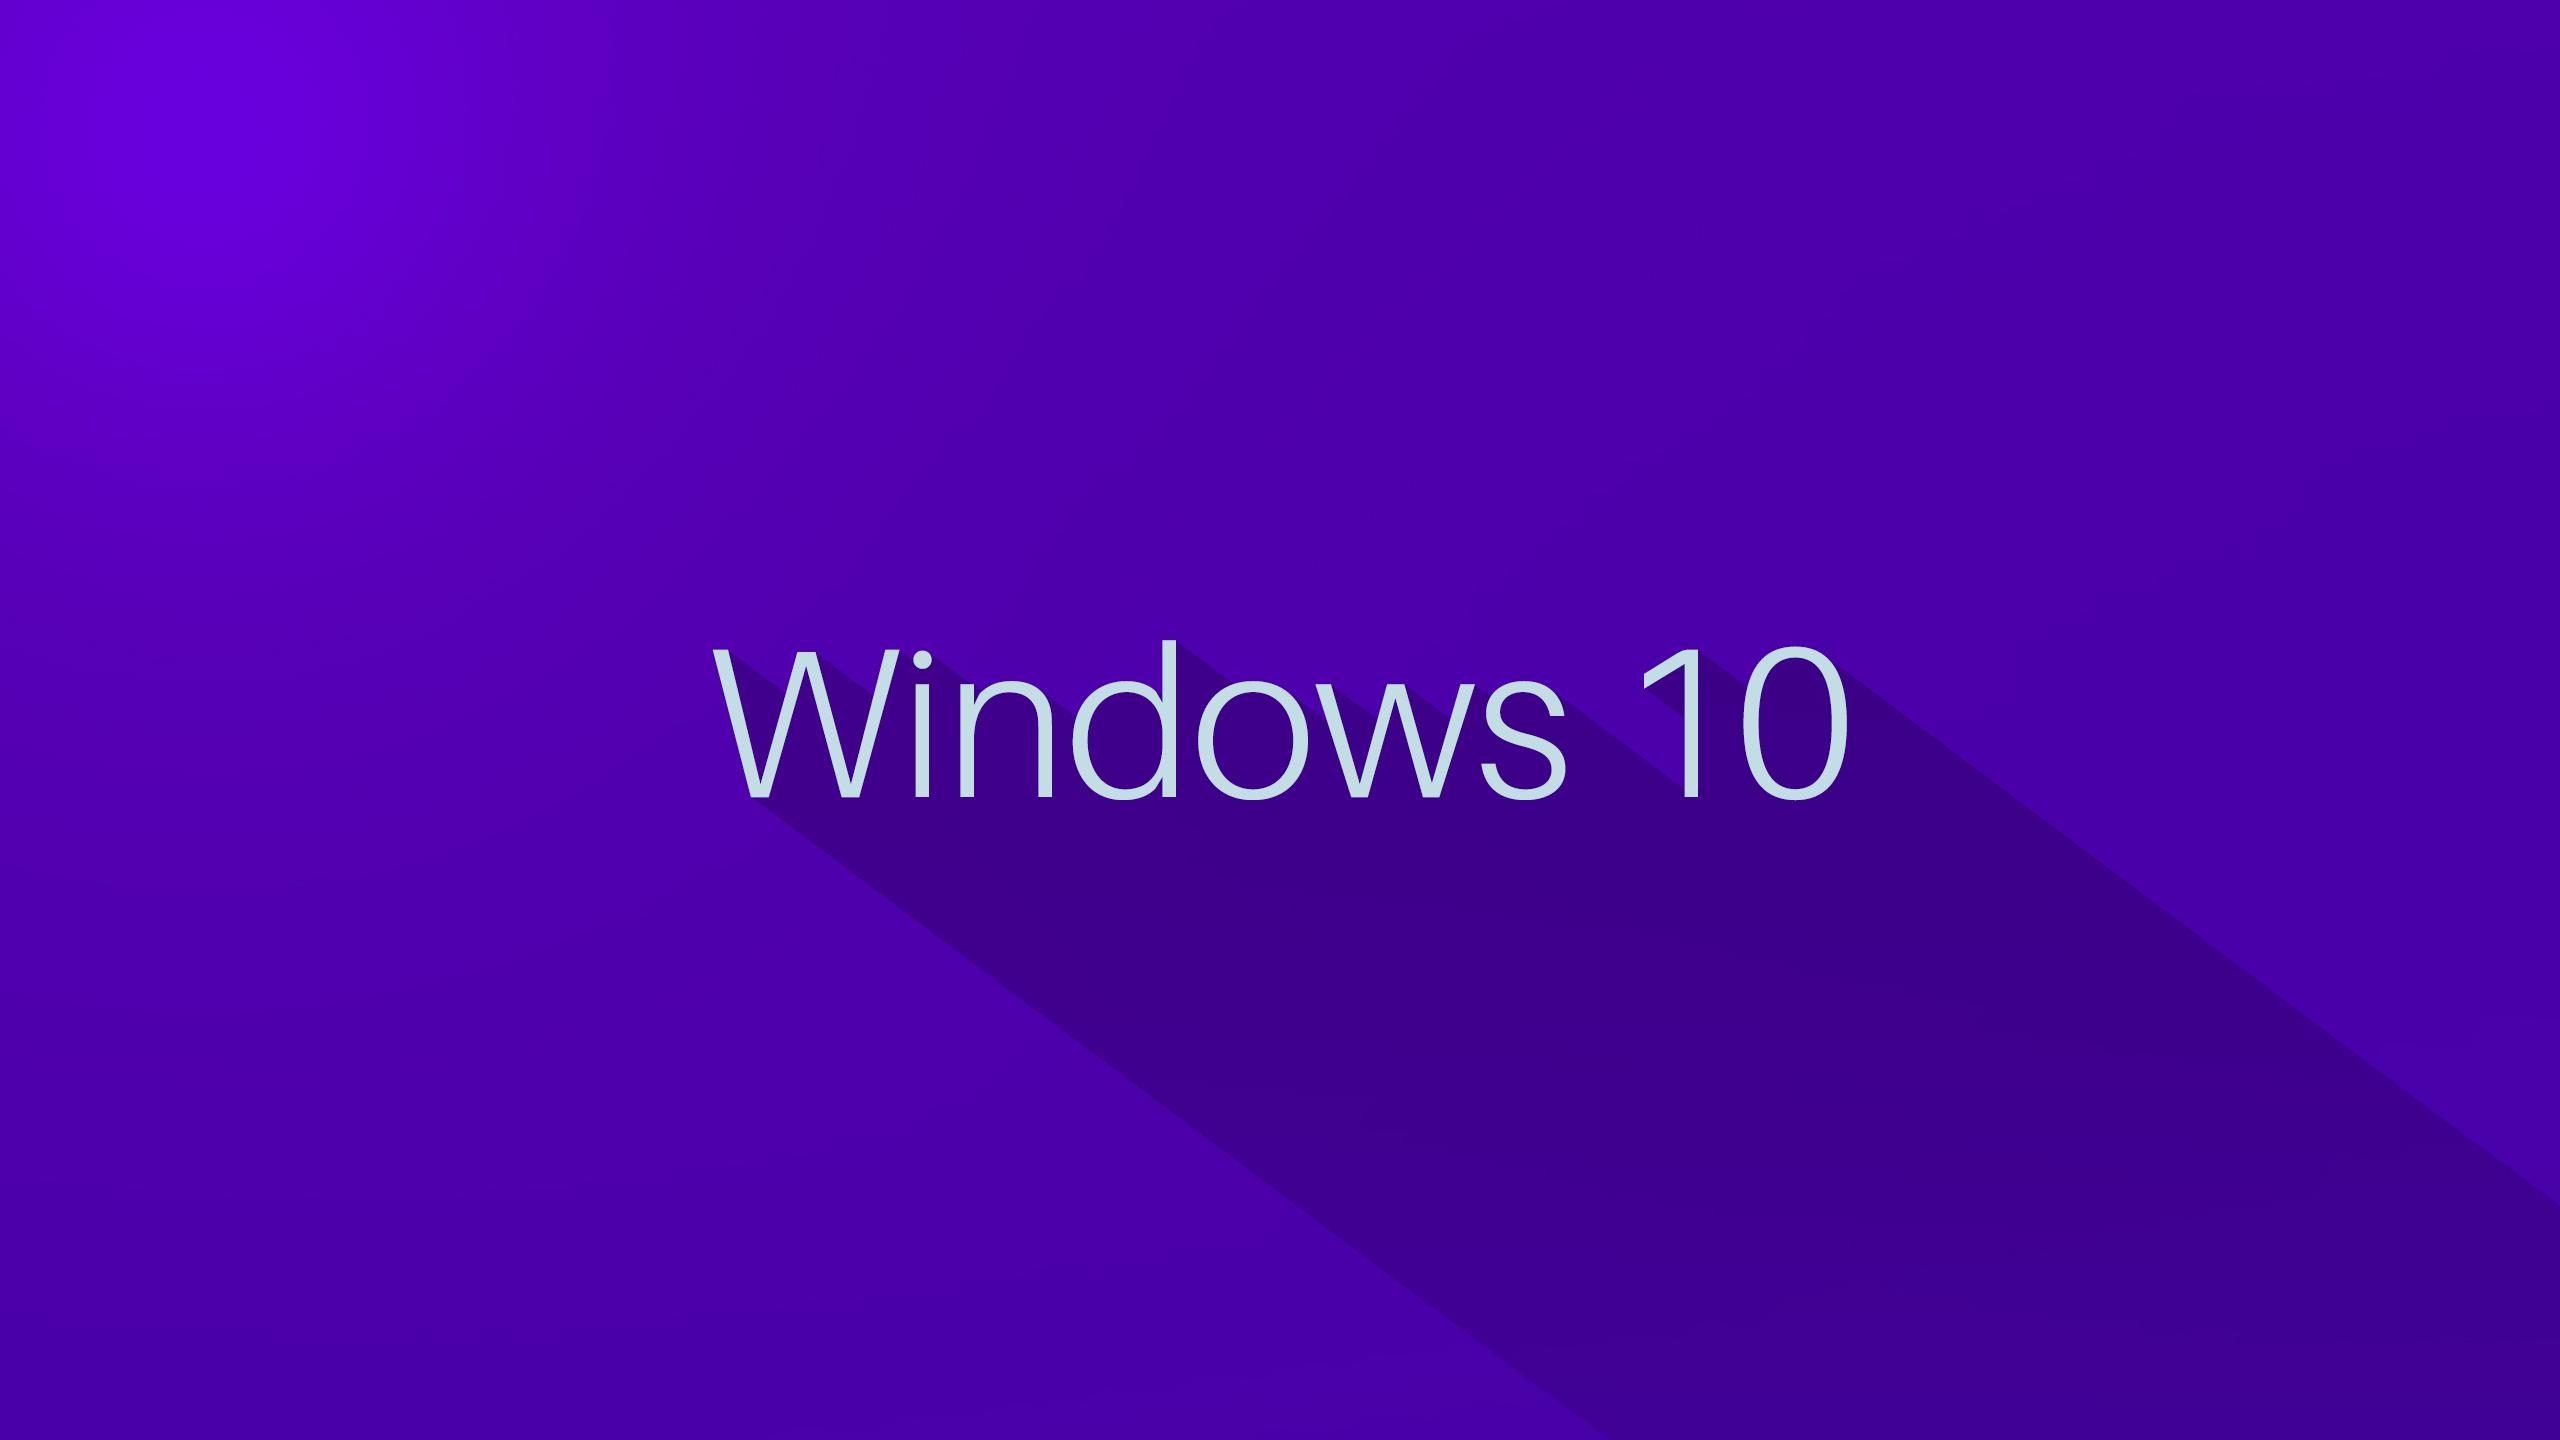 Windows 10 wallpaper by ljdesigner on deviantart for Window 10 wallpaper